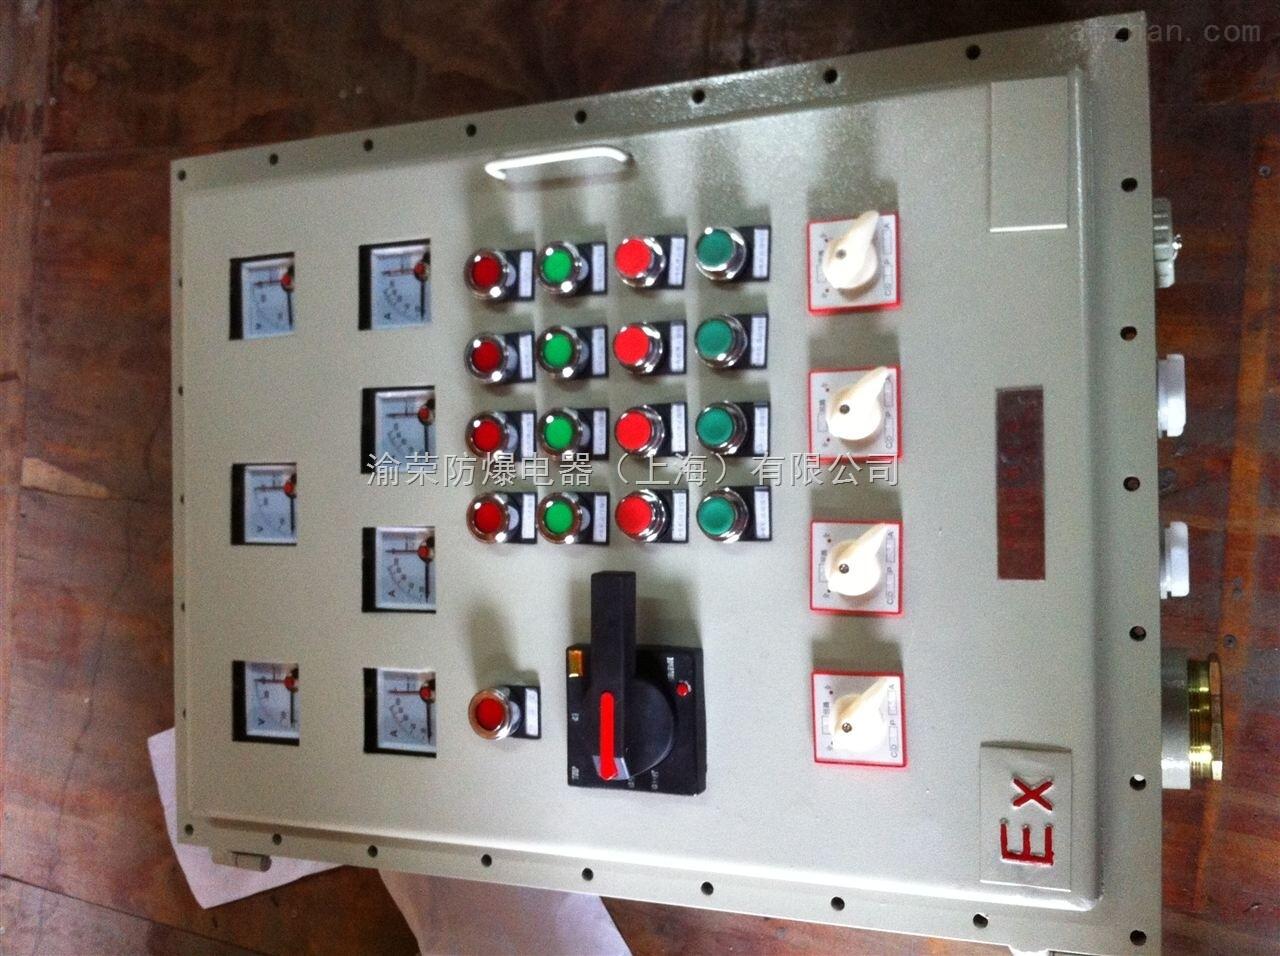 bqj 来宾bqj防爆自耦减压电磁启动器广西防爆星三角电器启动器价格